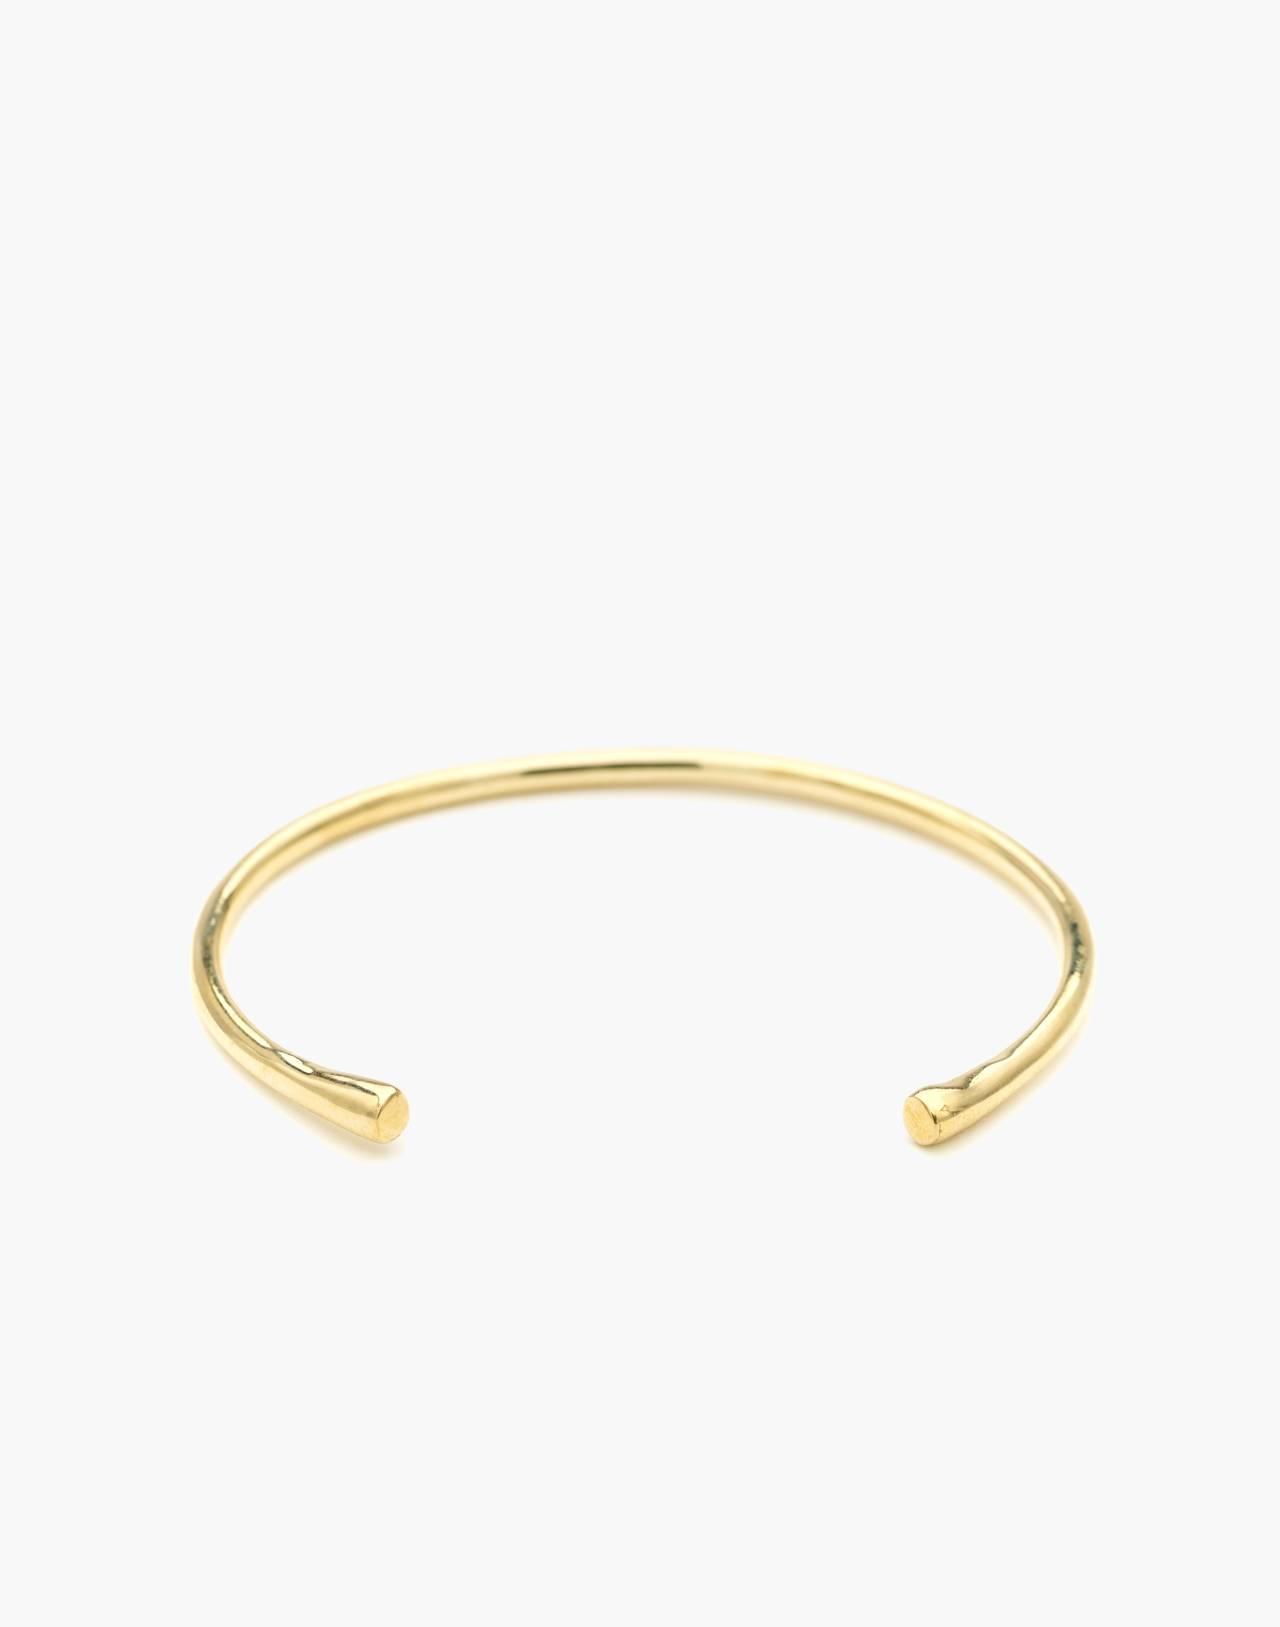 Odette New York® Pointe Cuff Bracelet in gold image 1